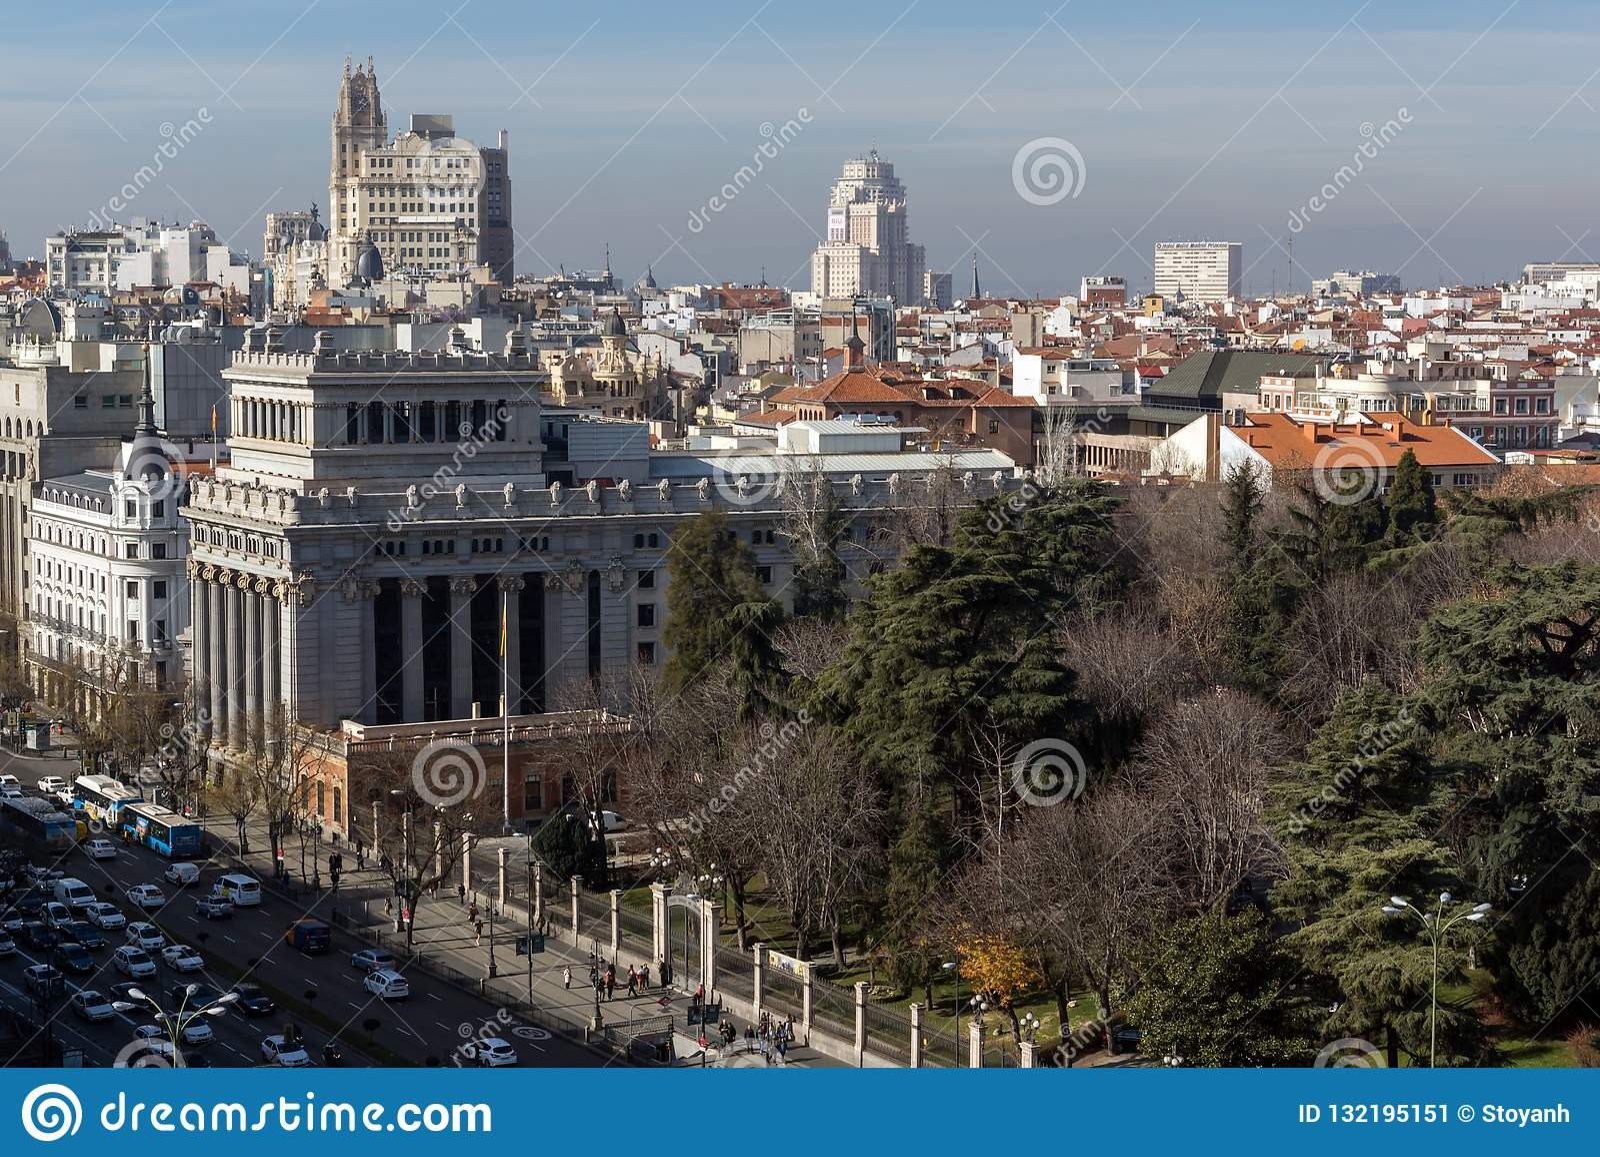 View From The Terrace Of Cybele Palace Palacio De Cibeles